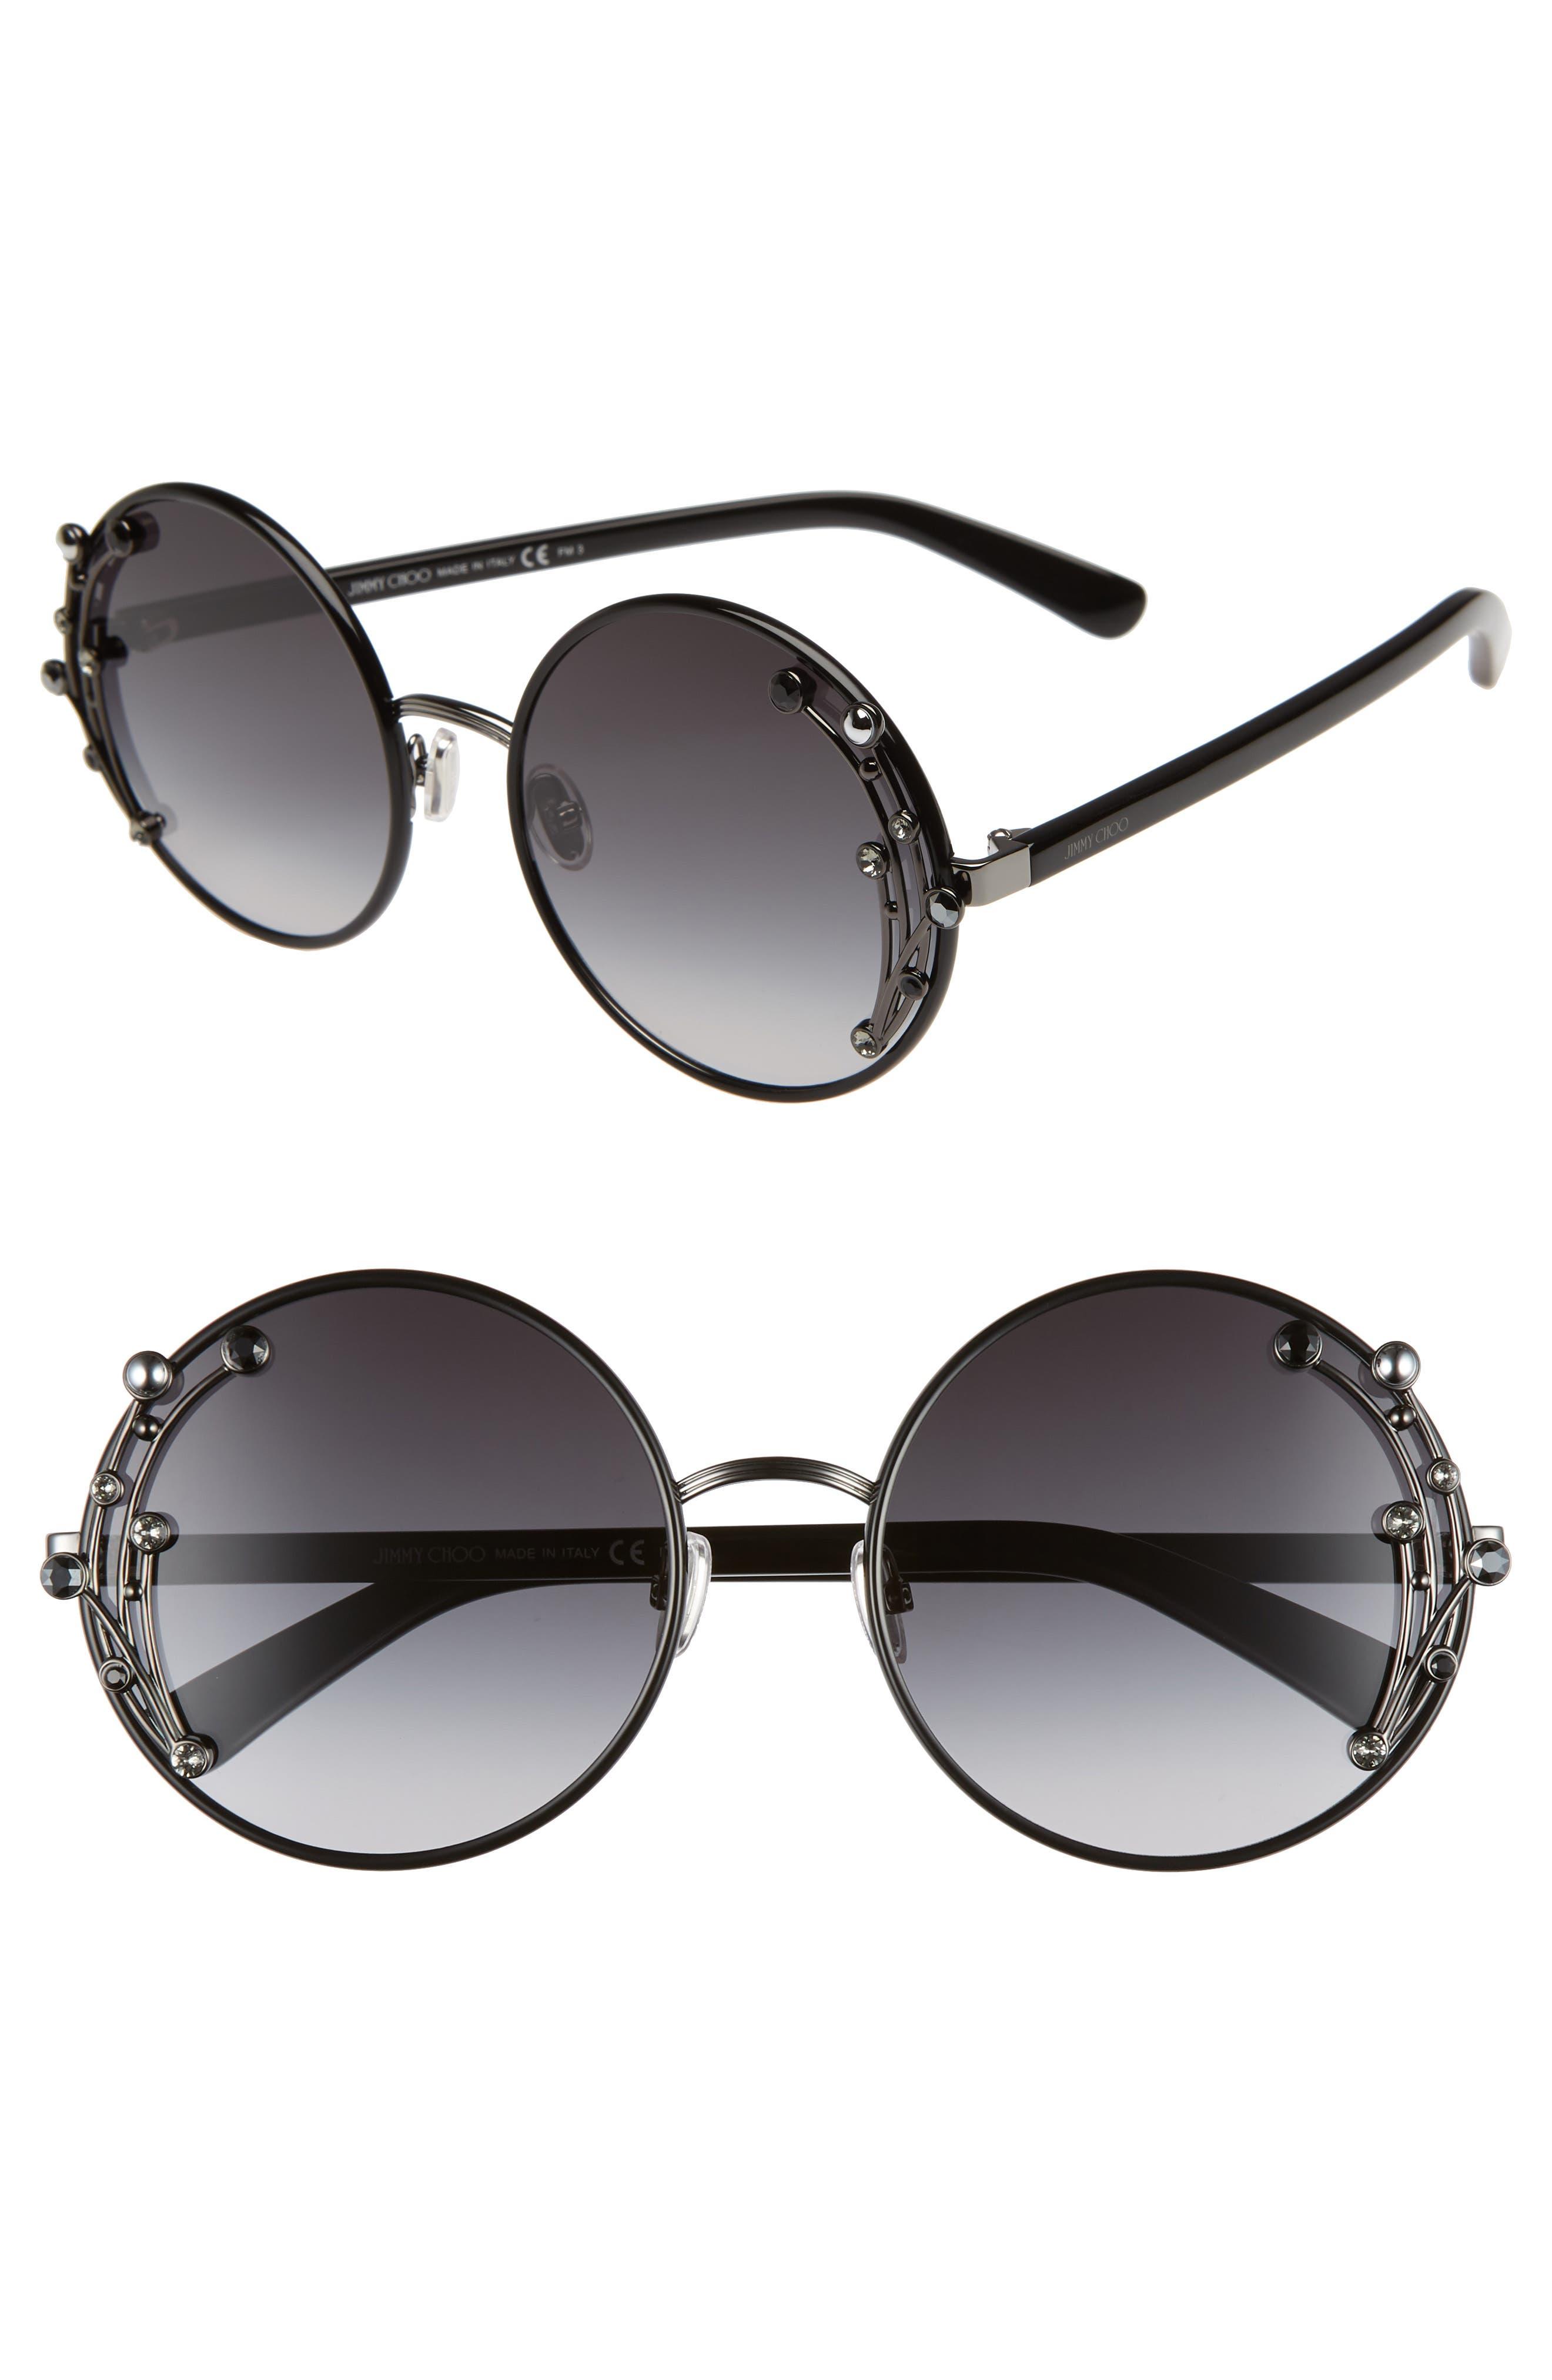 9706679541ff Jimmy Choo Sunglasses UPC   Barcode